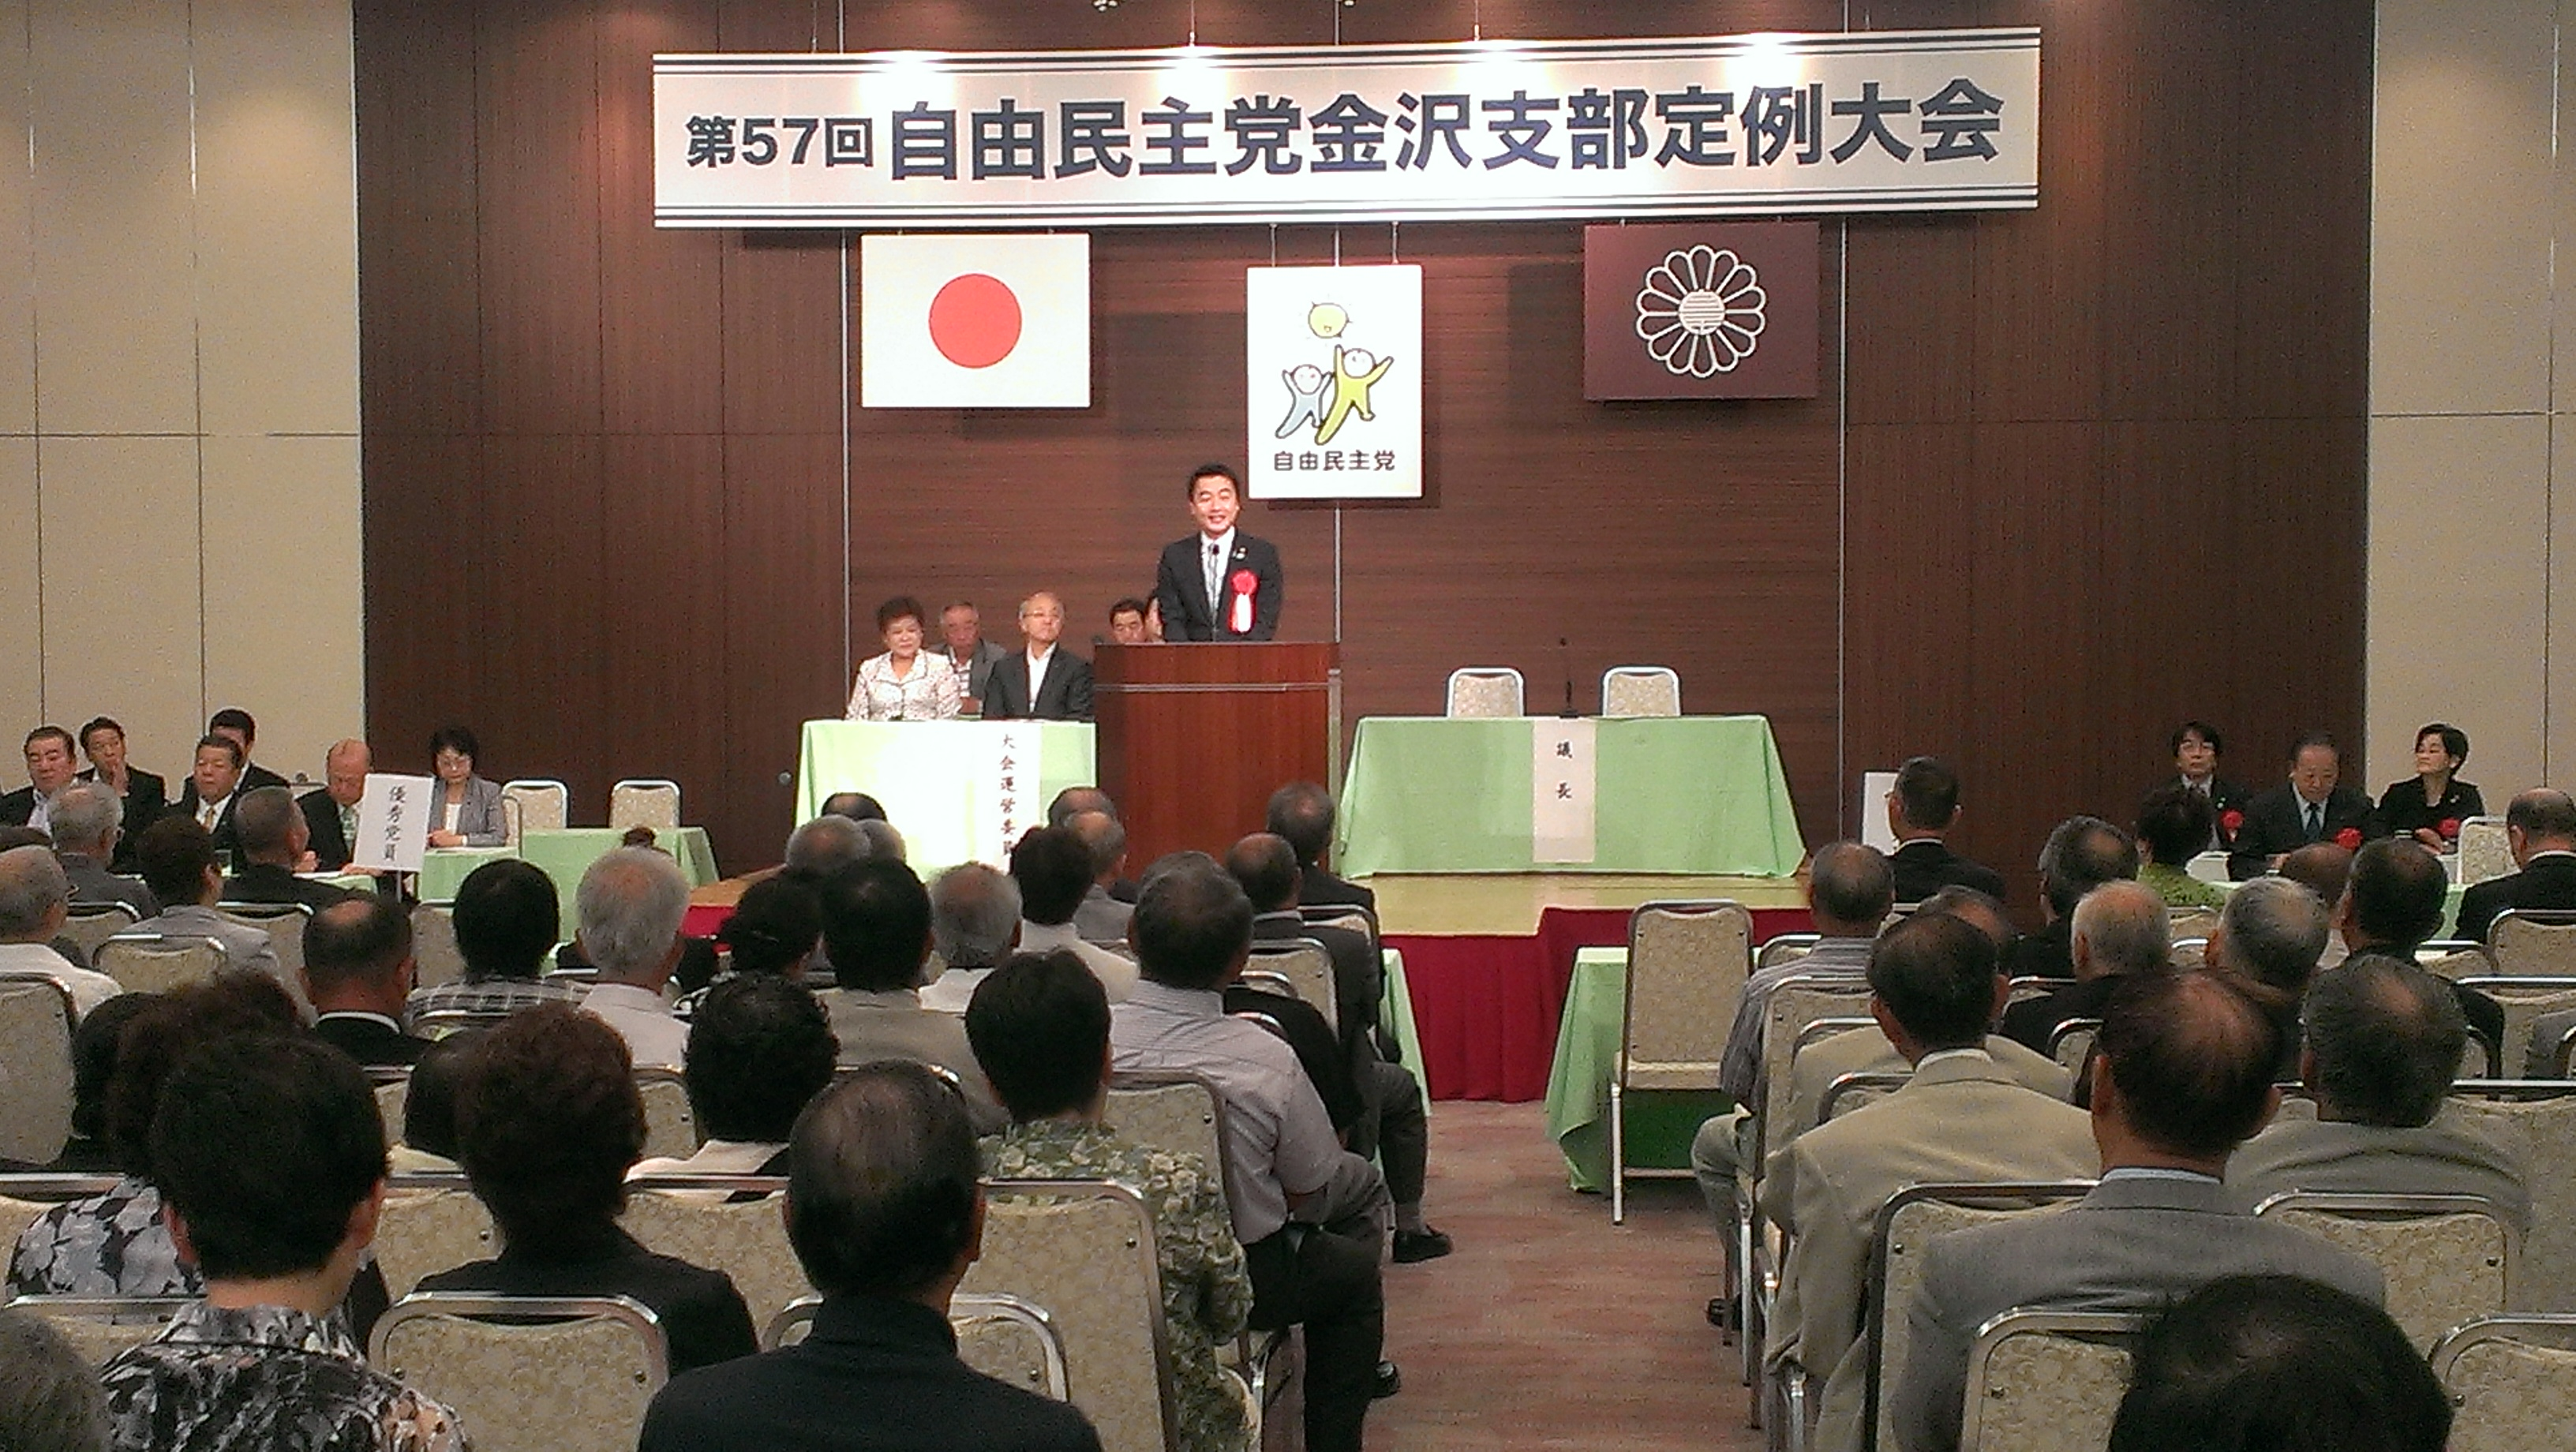 H25.9.14自民党金沢支部定例大会